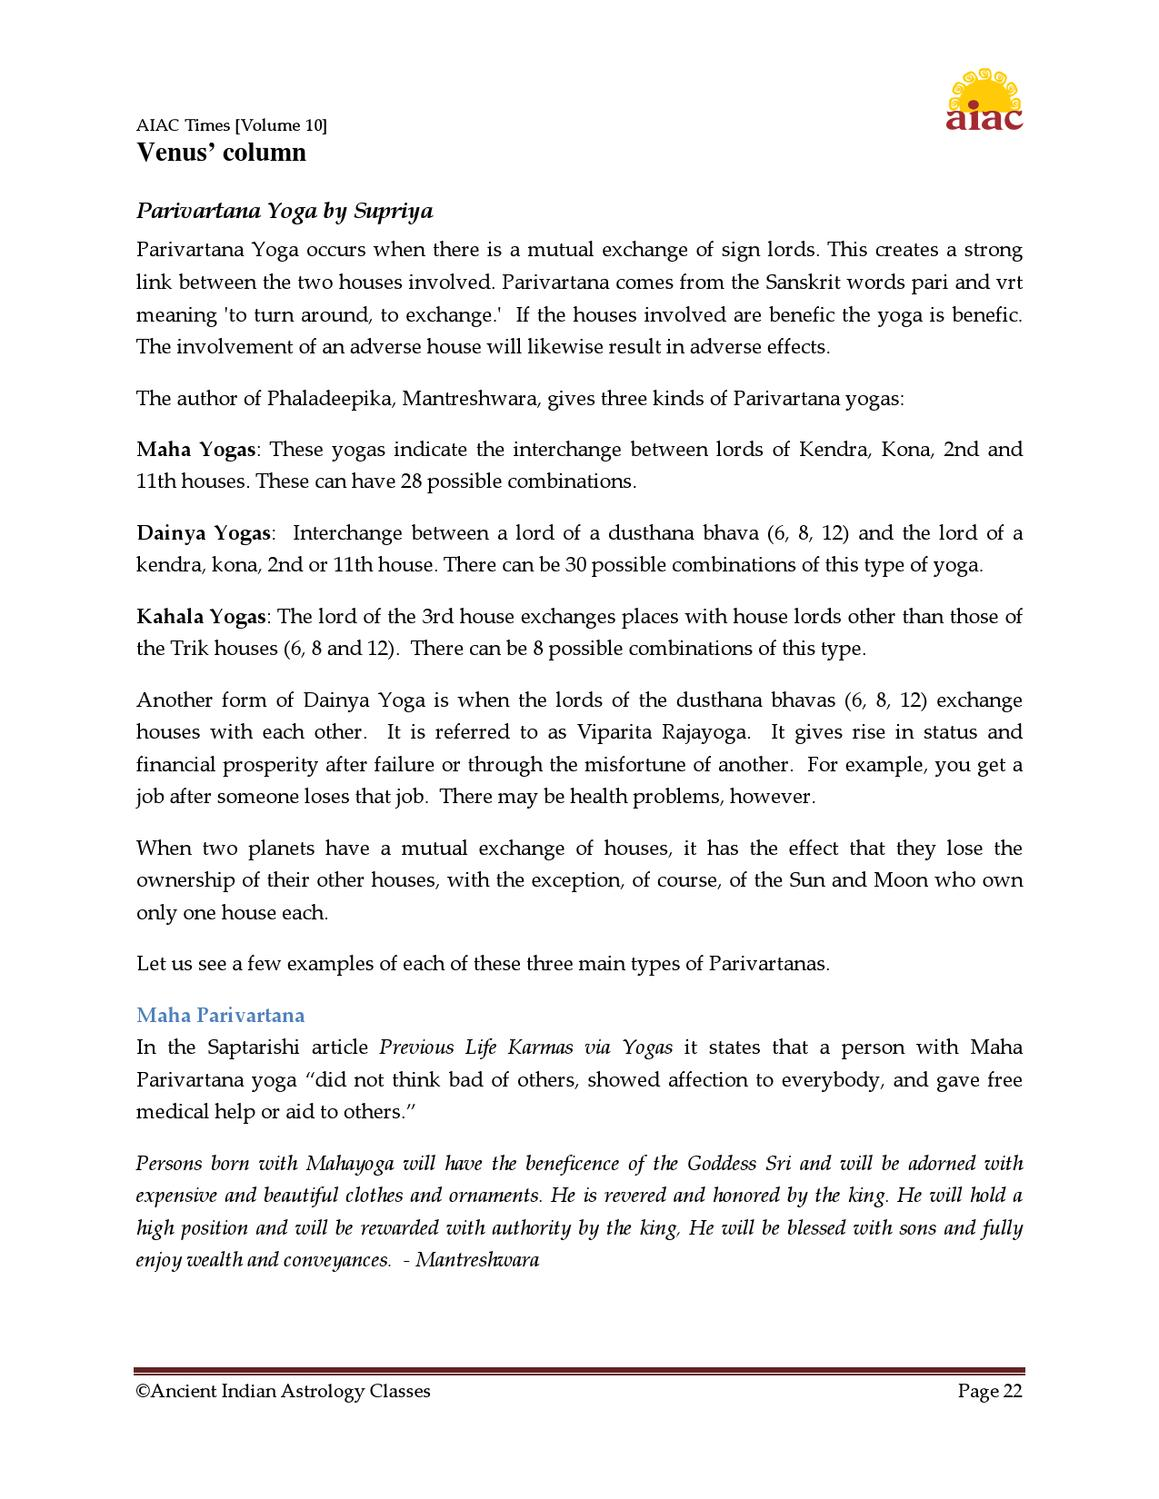 AIAC Times Vol 10 by Saptarishis Astrology - issuu